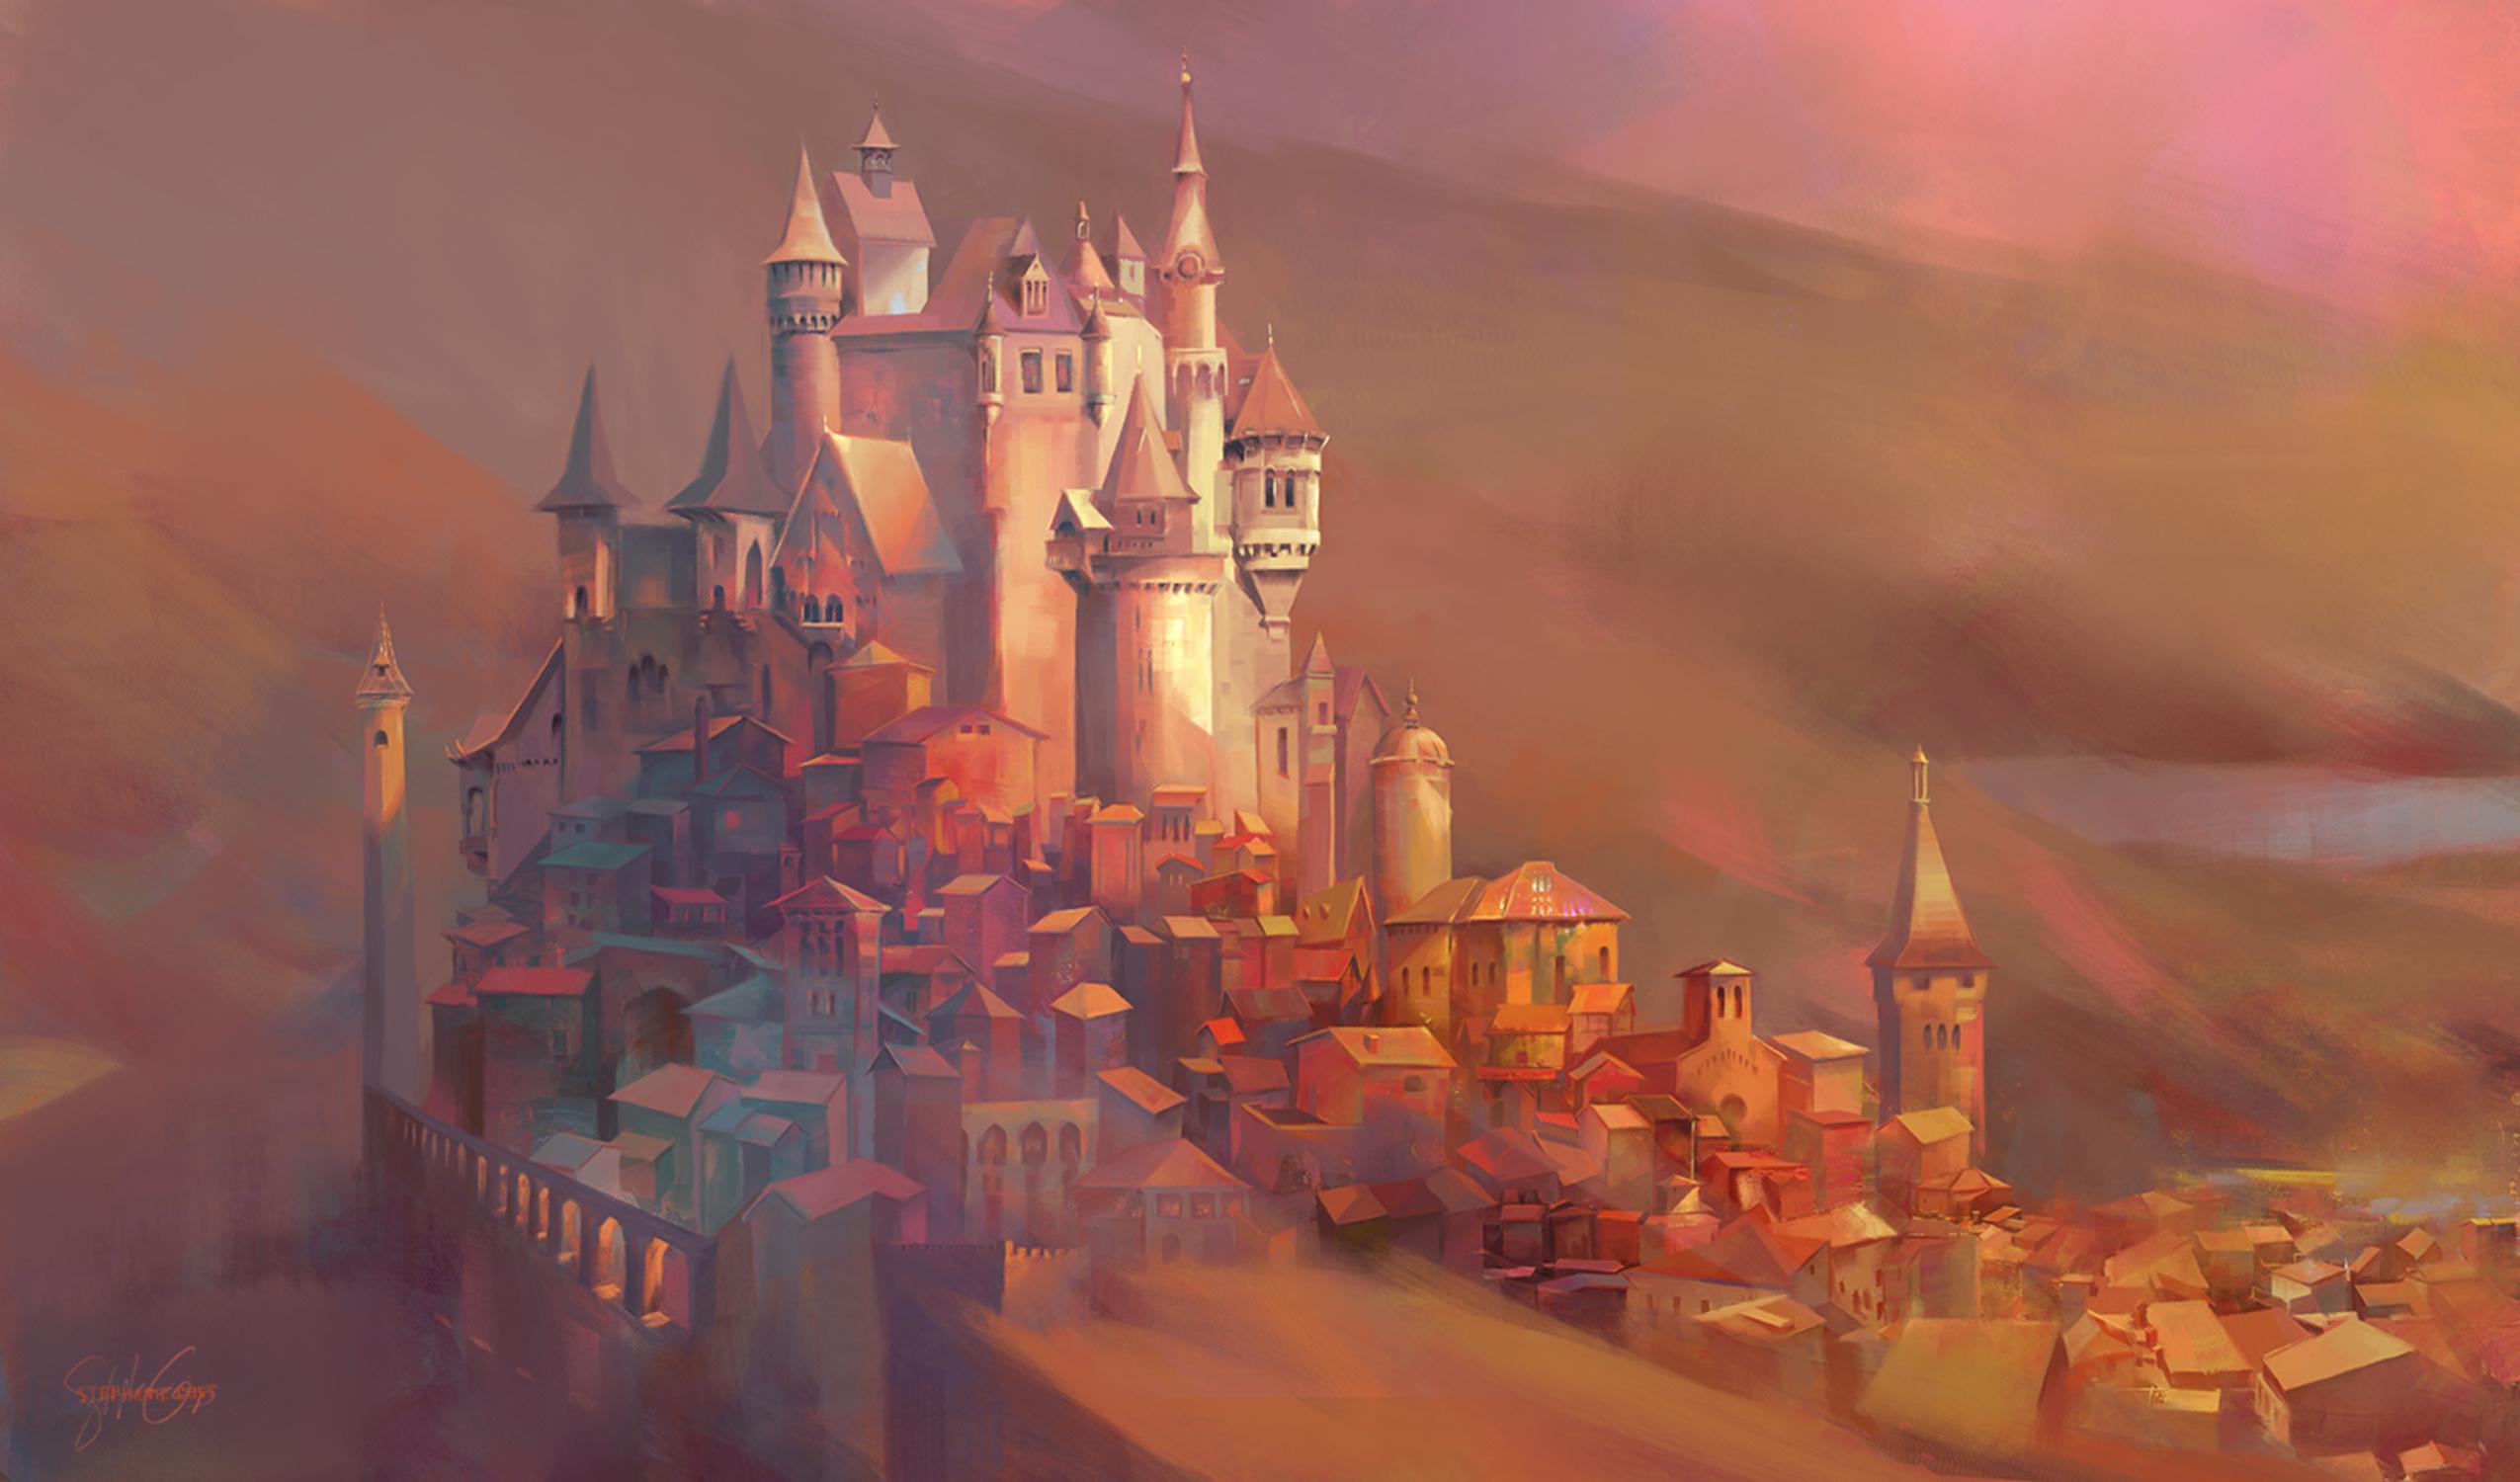 Torendaar, The Golden City Artwork by Stephanie Cost